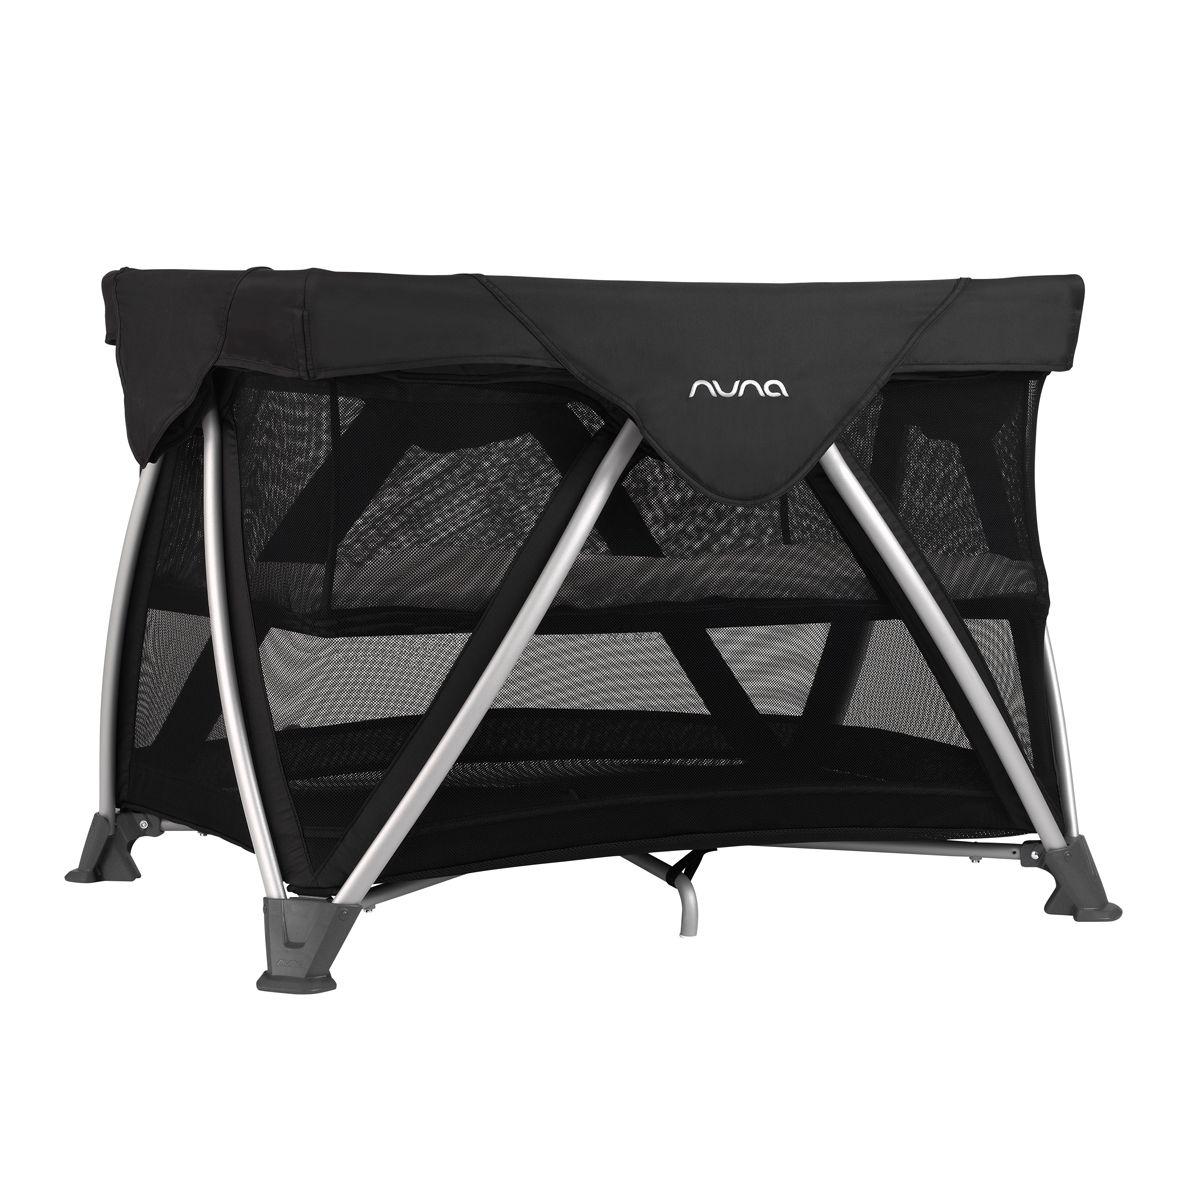 Nuna Sena Aire Travel Crib in 2020 Travel crib, Nuna